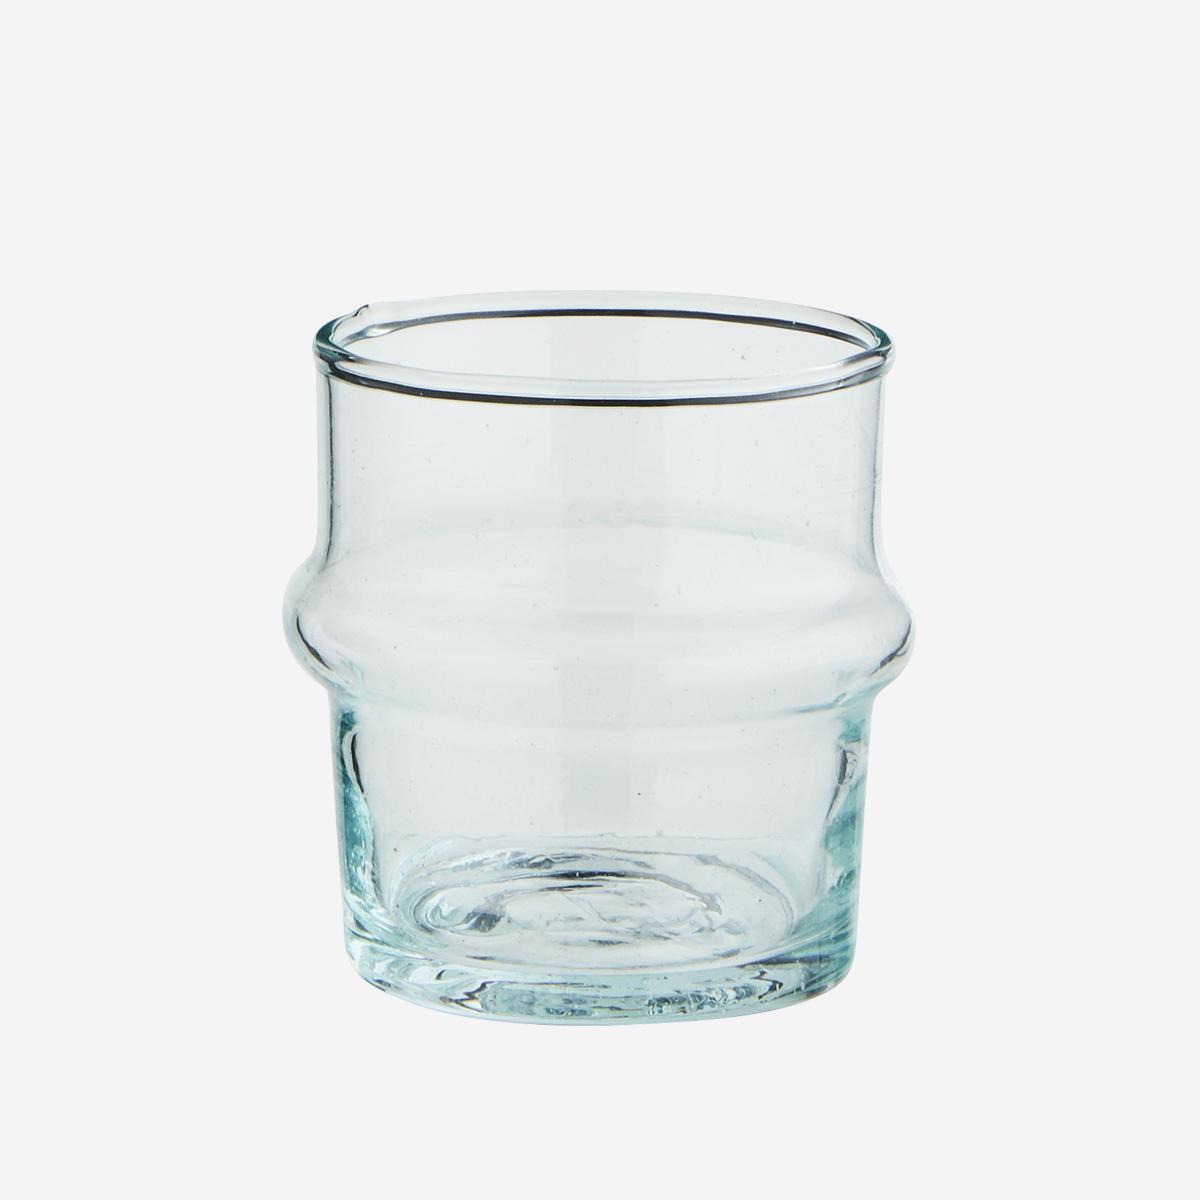 Petit verre Beldi transparent (verre recyclé) * Madam Stoltz